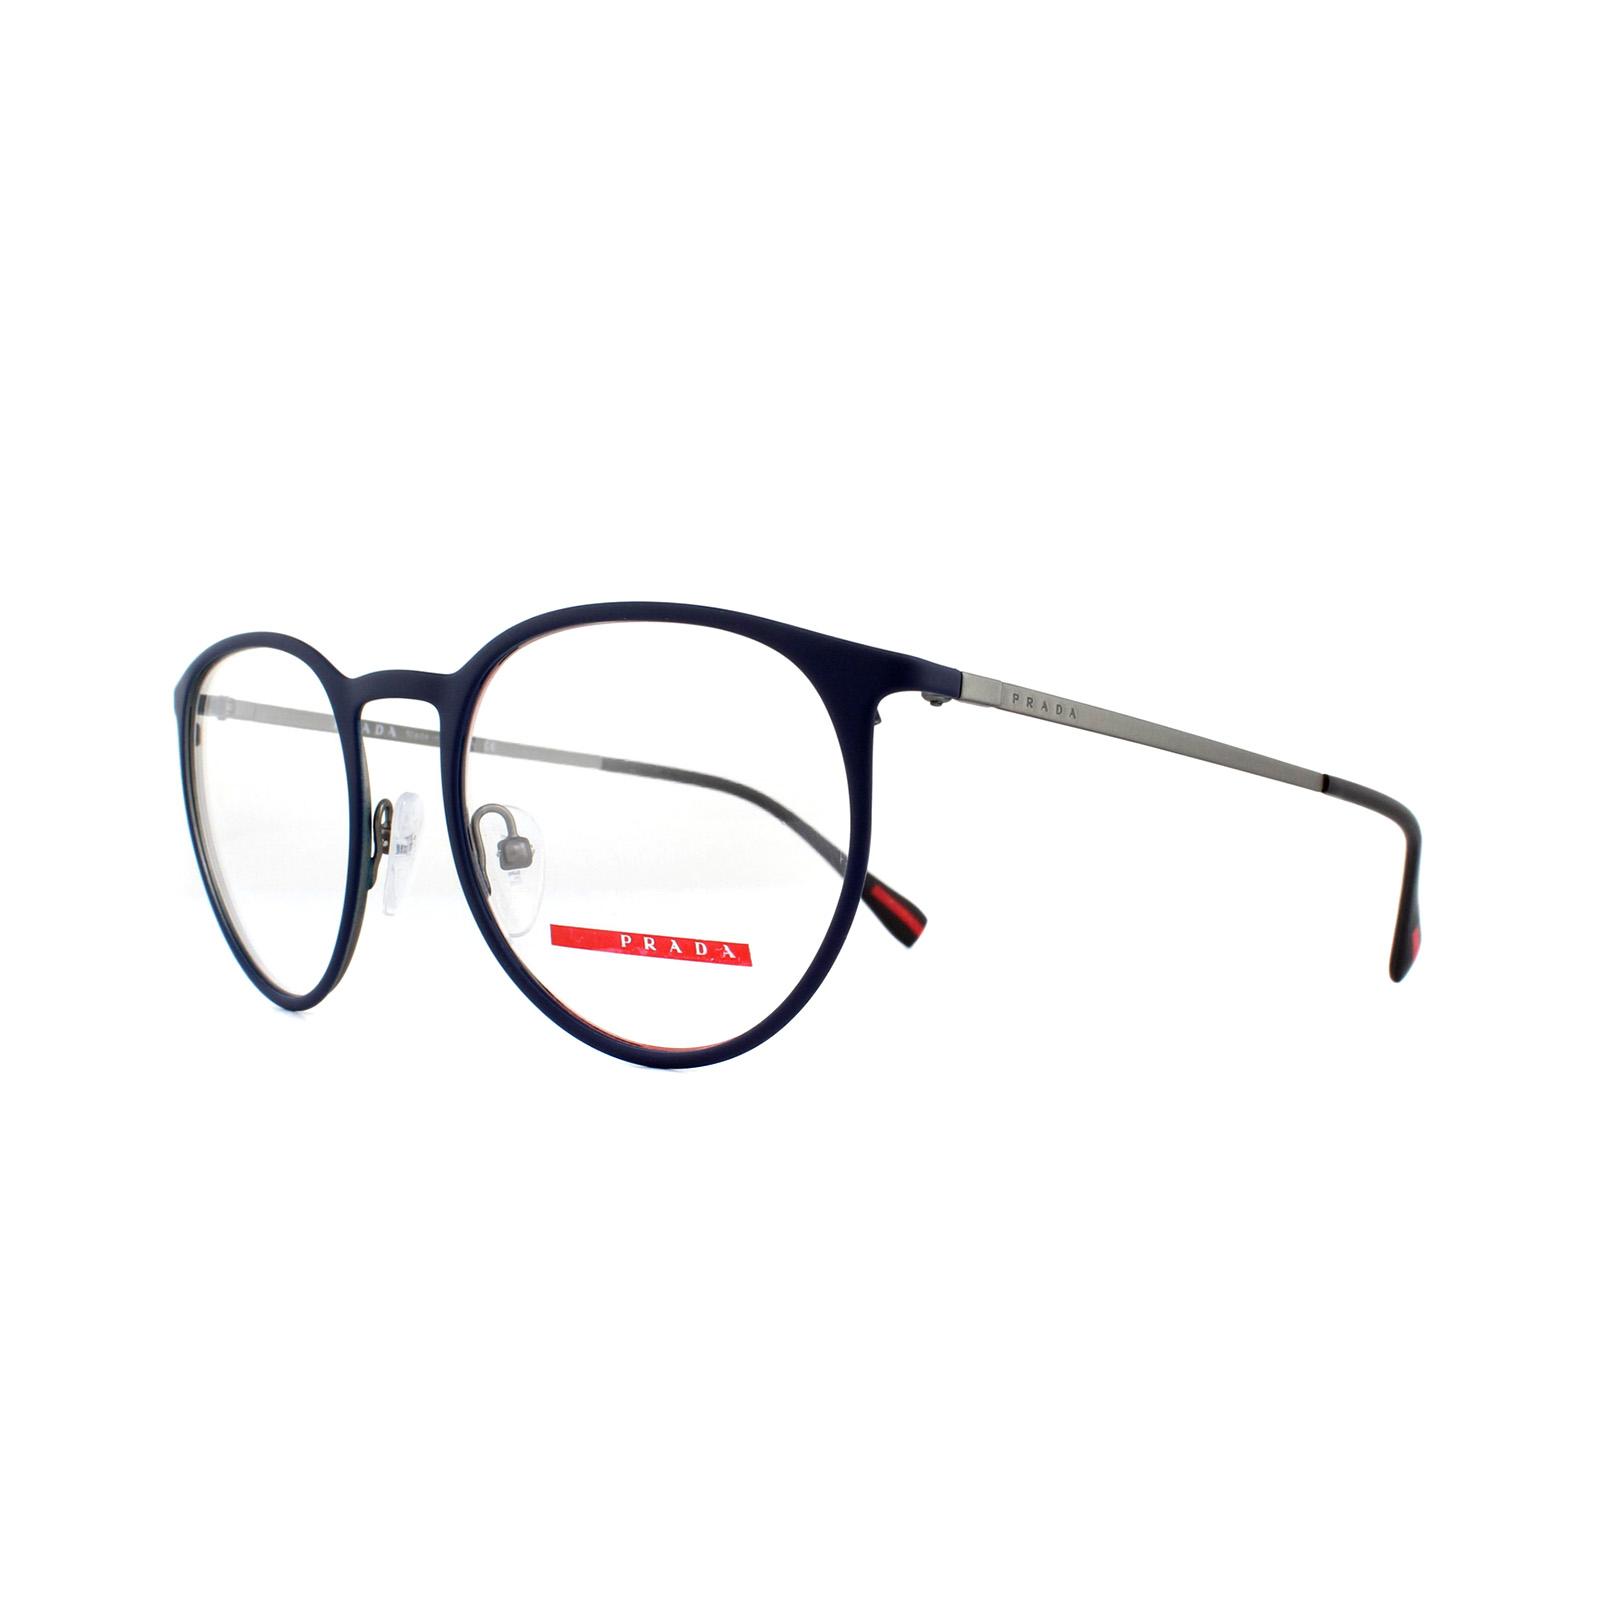 2279650778a8 Sentinel Prada Sport Glasses Frames PS 50HV TFY1O1 Top Blue Gunmetal 50mm  Mens